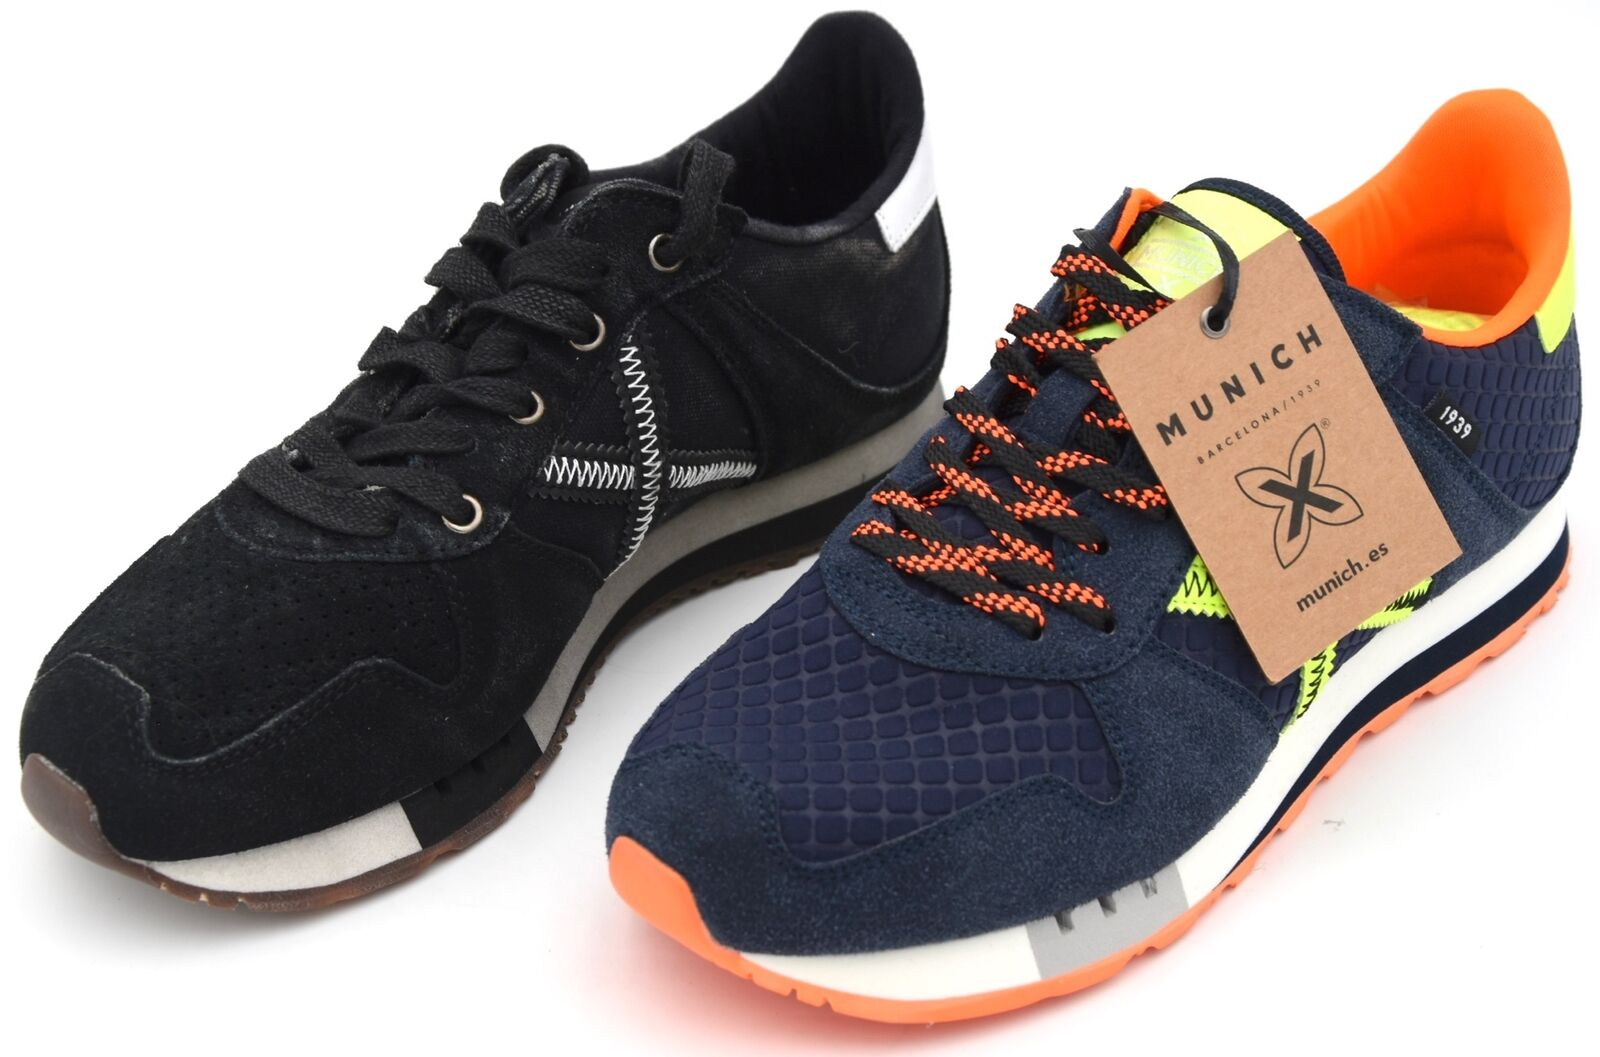 Munich hombres ska zapatillas deportivas estilo libre862 0285 - 862 0294 Massana